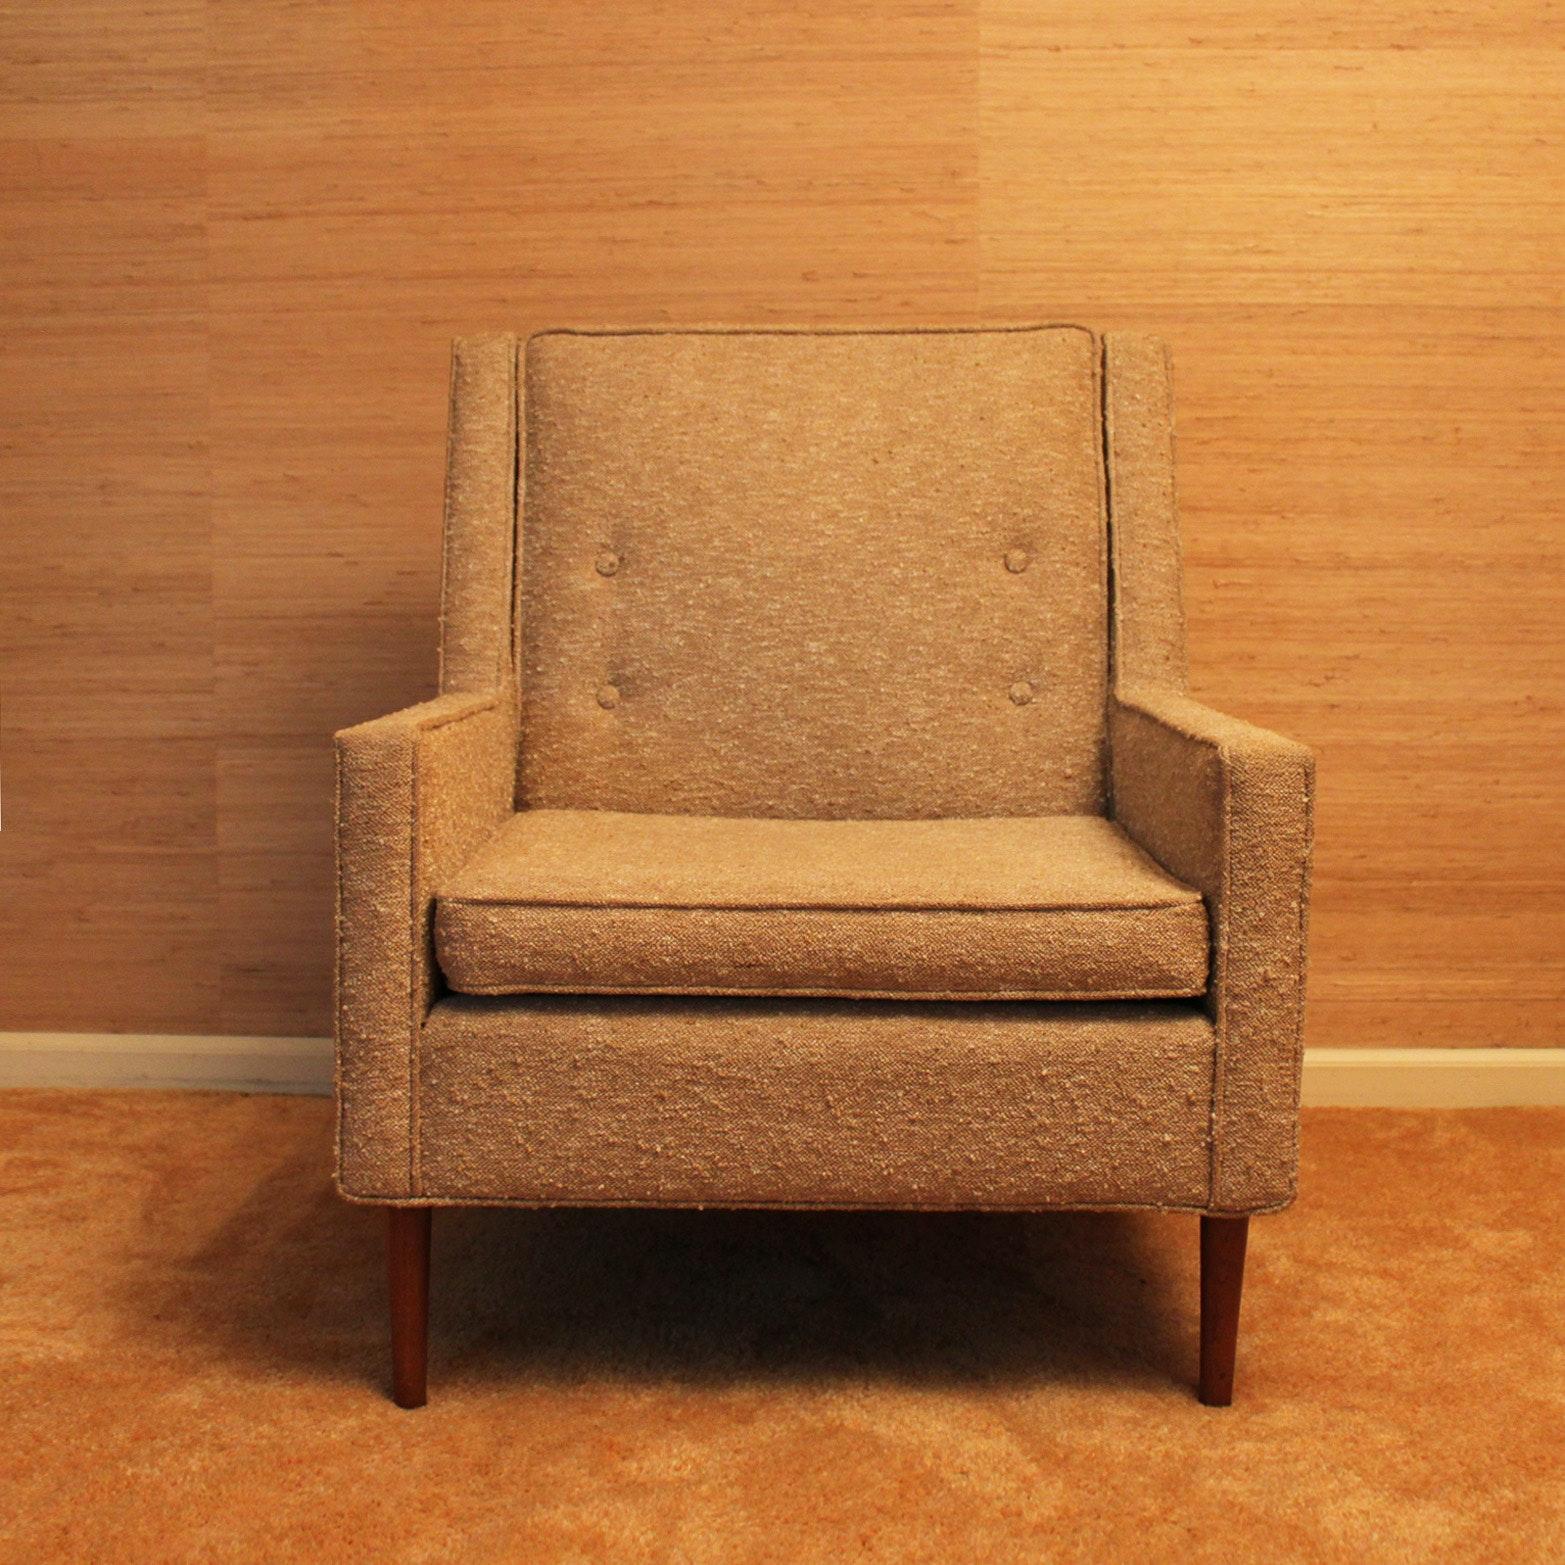 Charmant Montclair Furniture Mid Century Chair ...